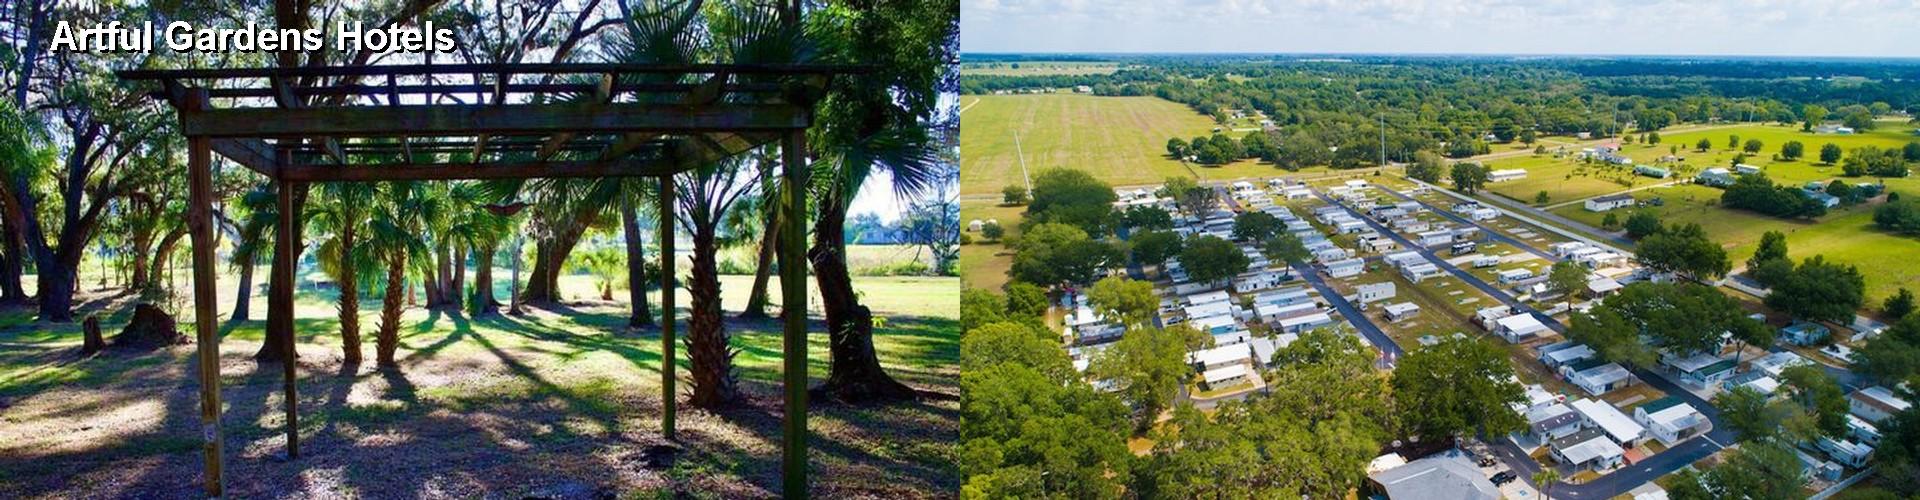 43 Hotels Near Artful Gardens In Zephyrhills Fl